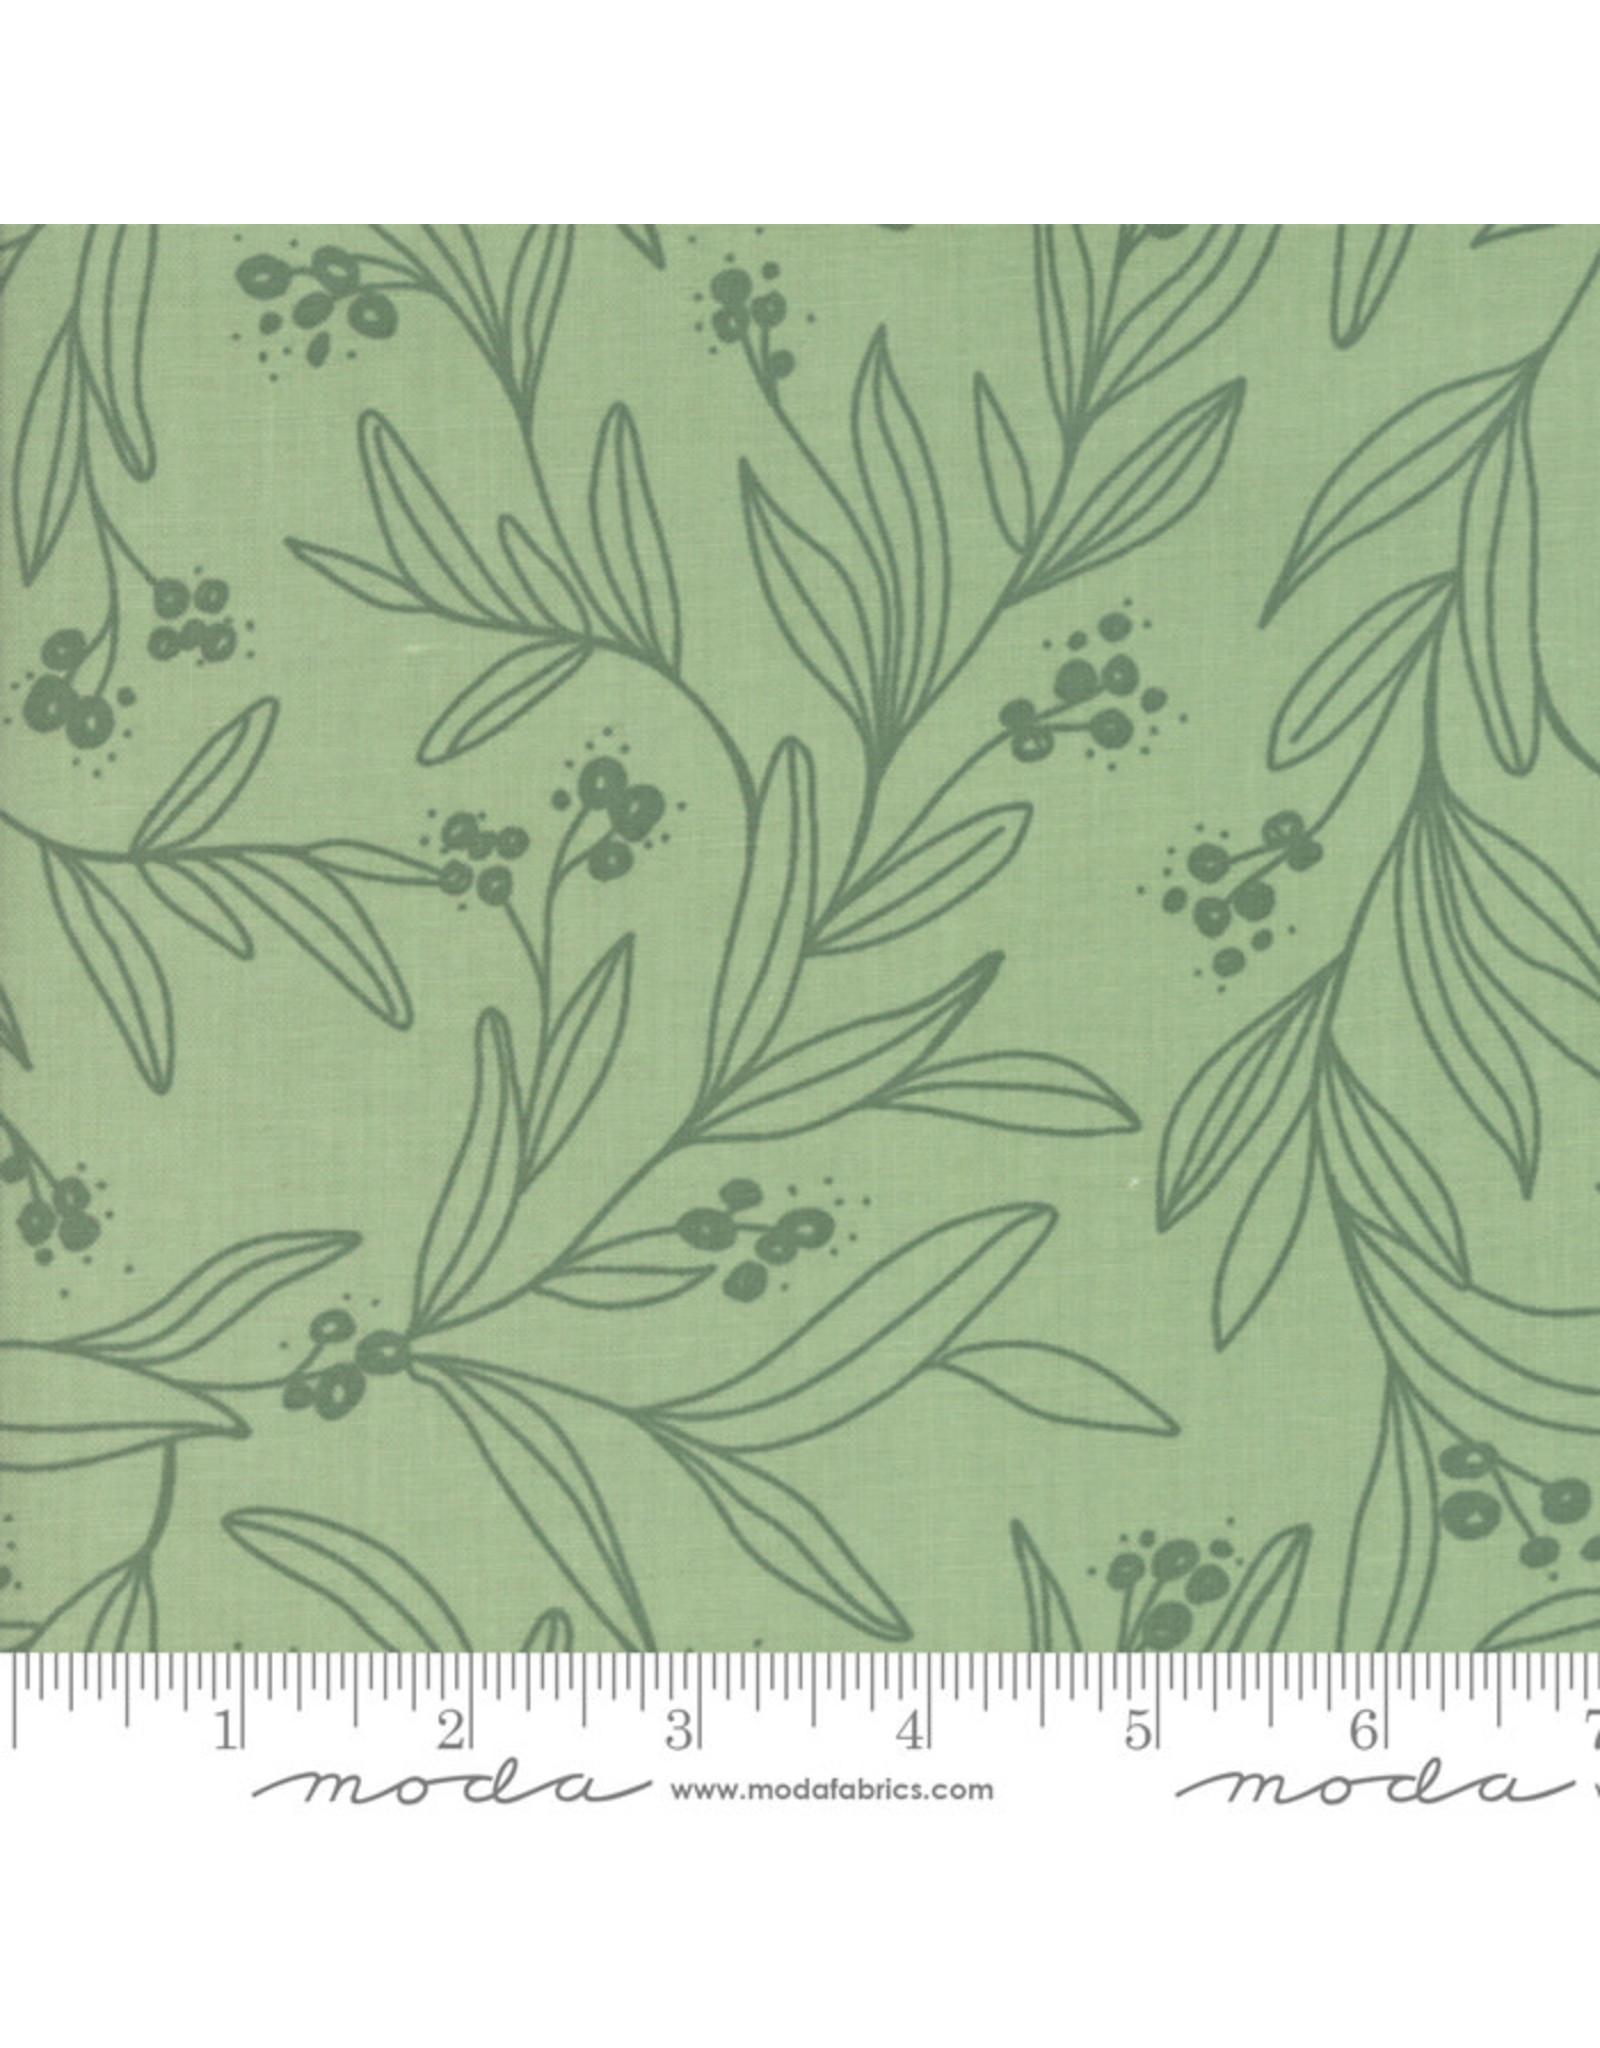 Moda Little Tree - Mistletoe Light Green